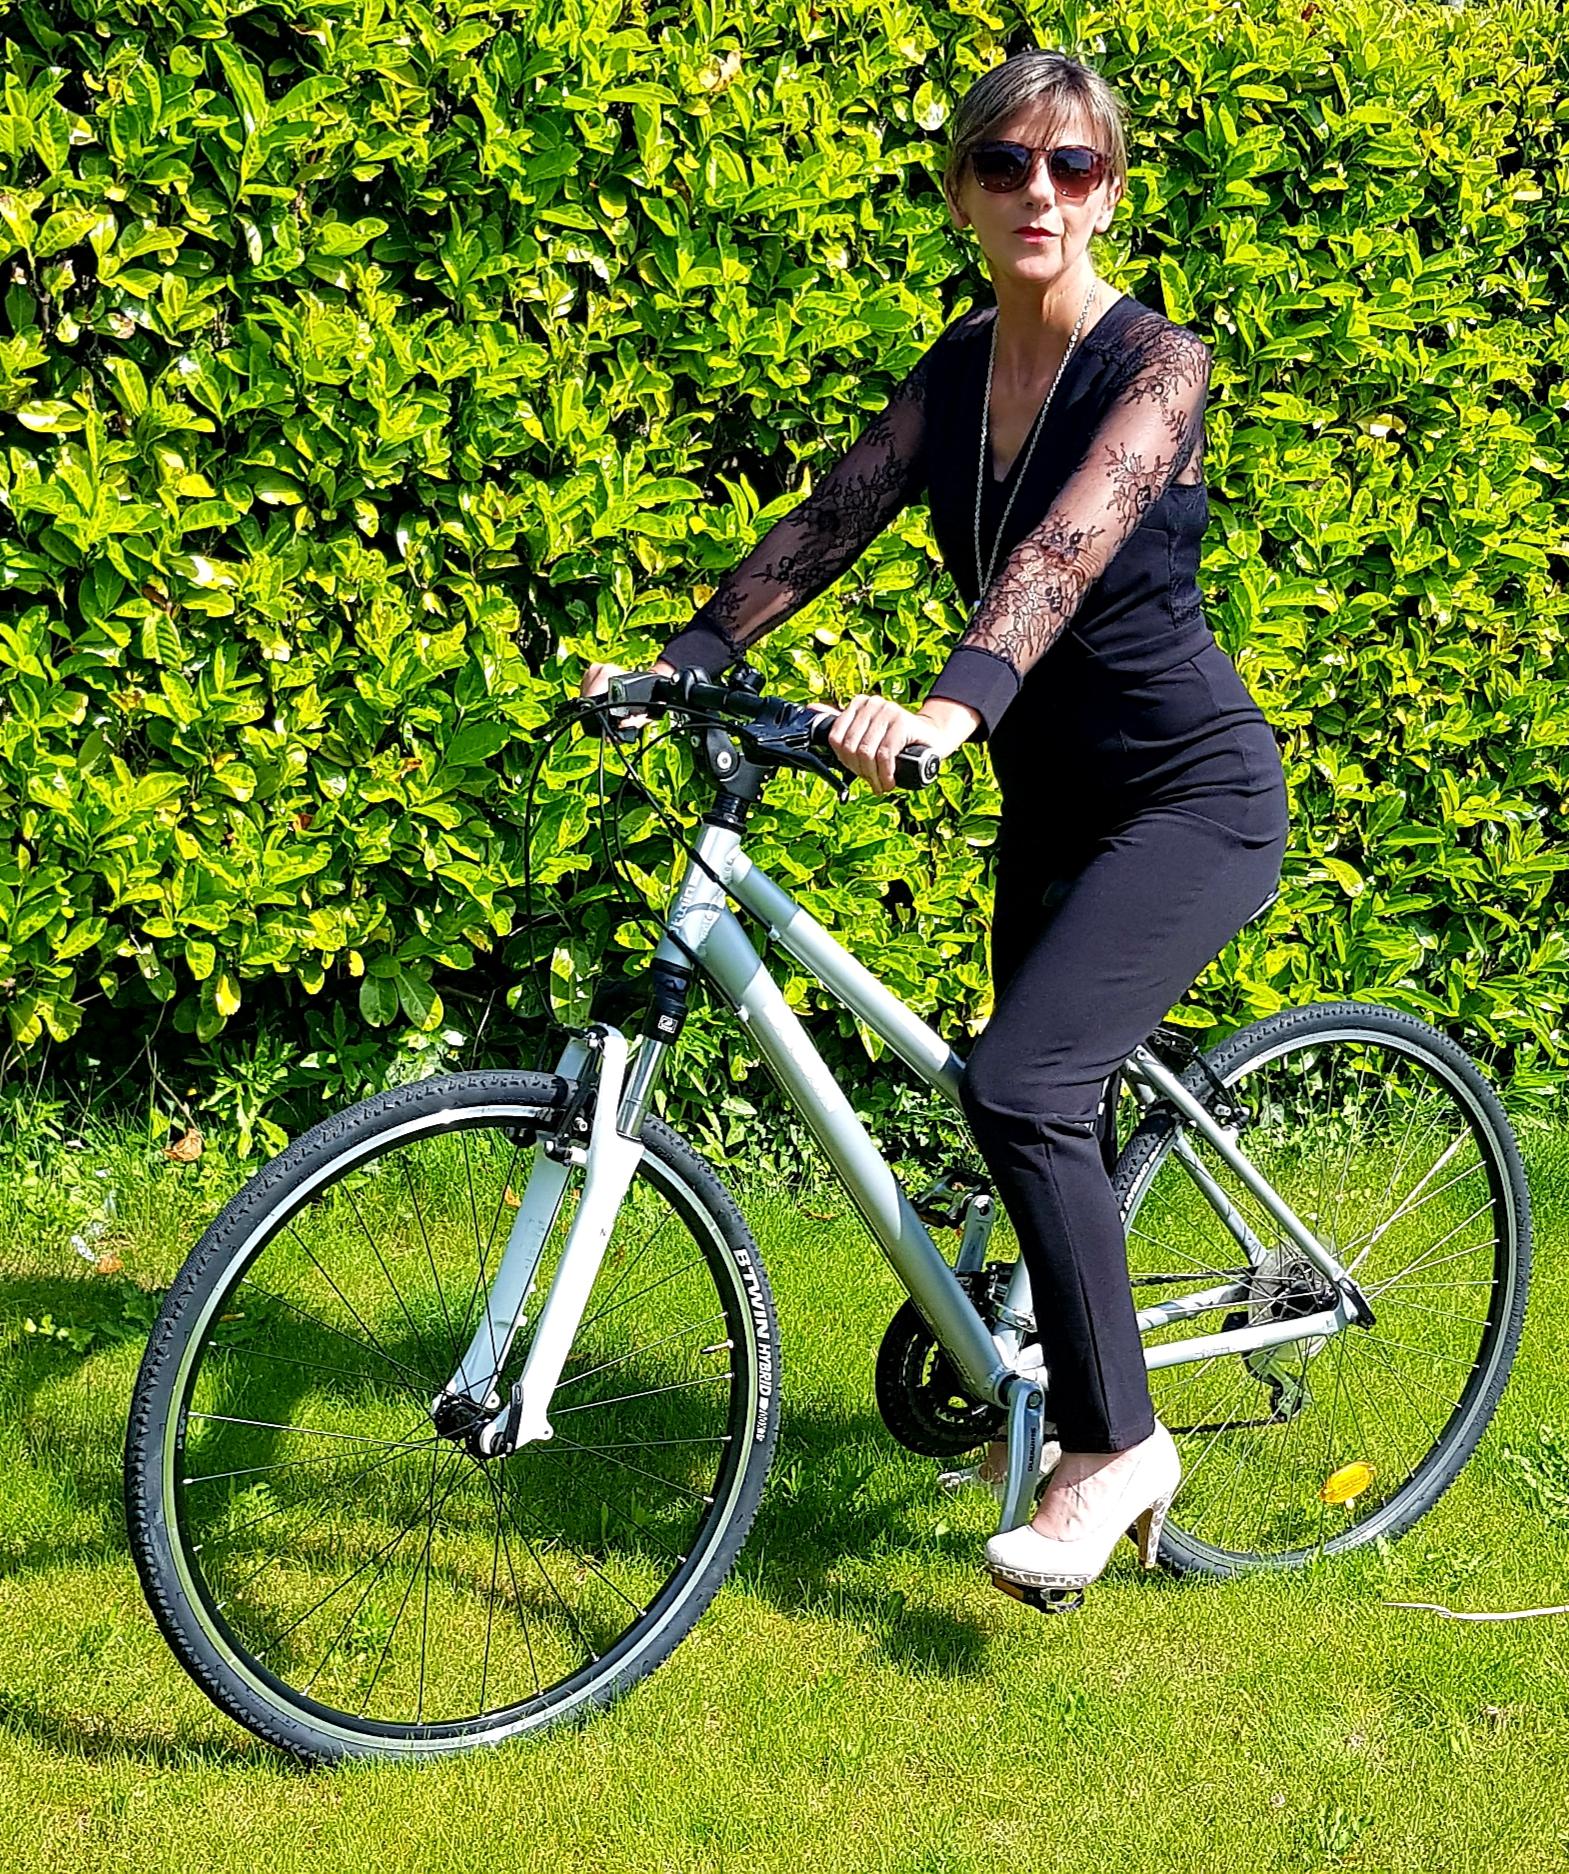 SANDRINE MOREAU – Cycle Chic